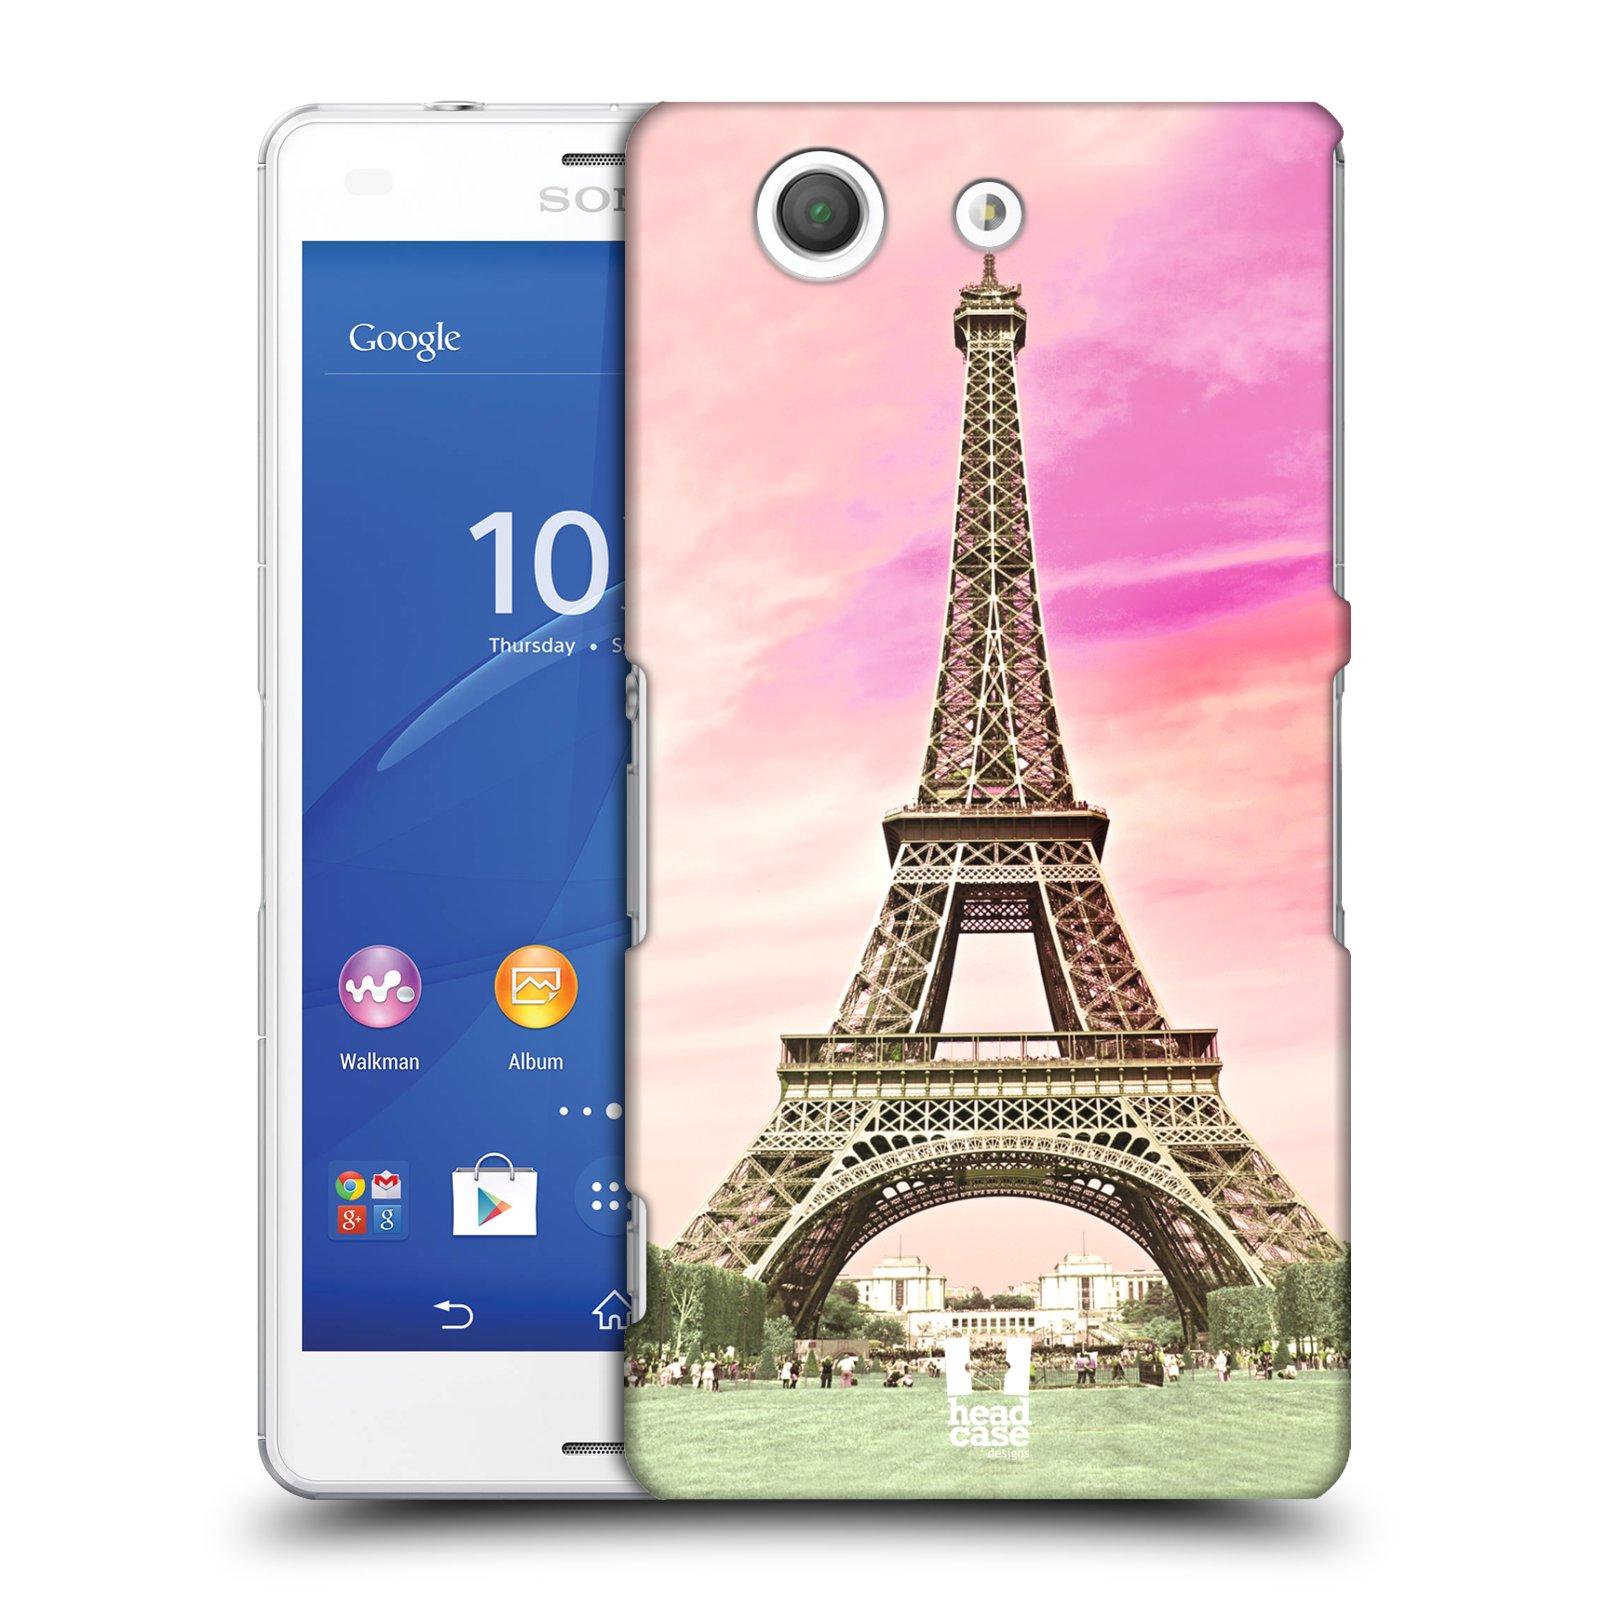 Pouzdro na mobil Sony Xperia Z3 COMPACT - HEAD CASE - historická místa Eiffelova věž Paříž